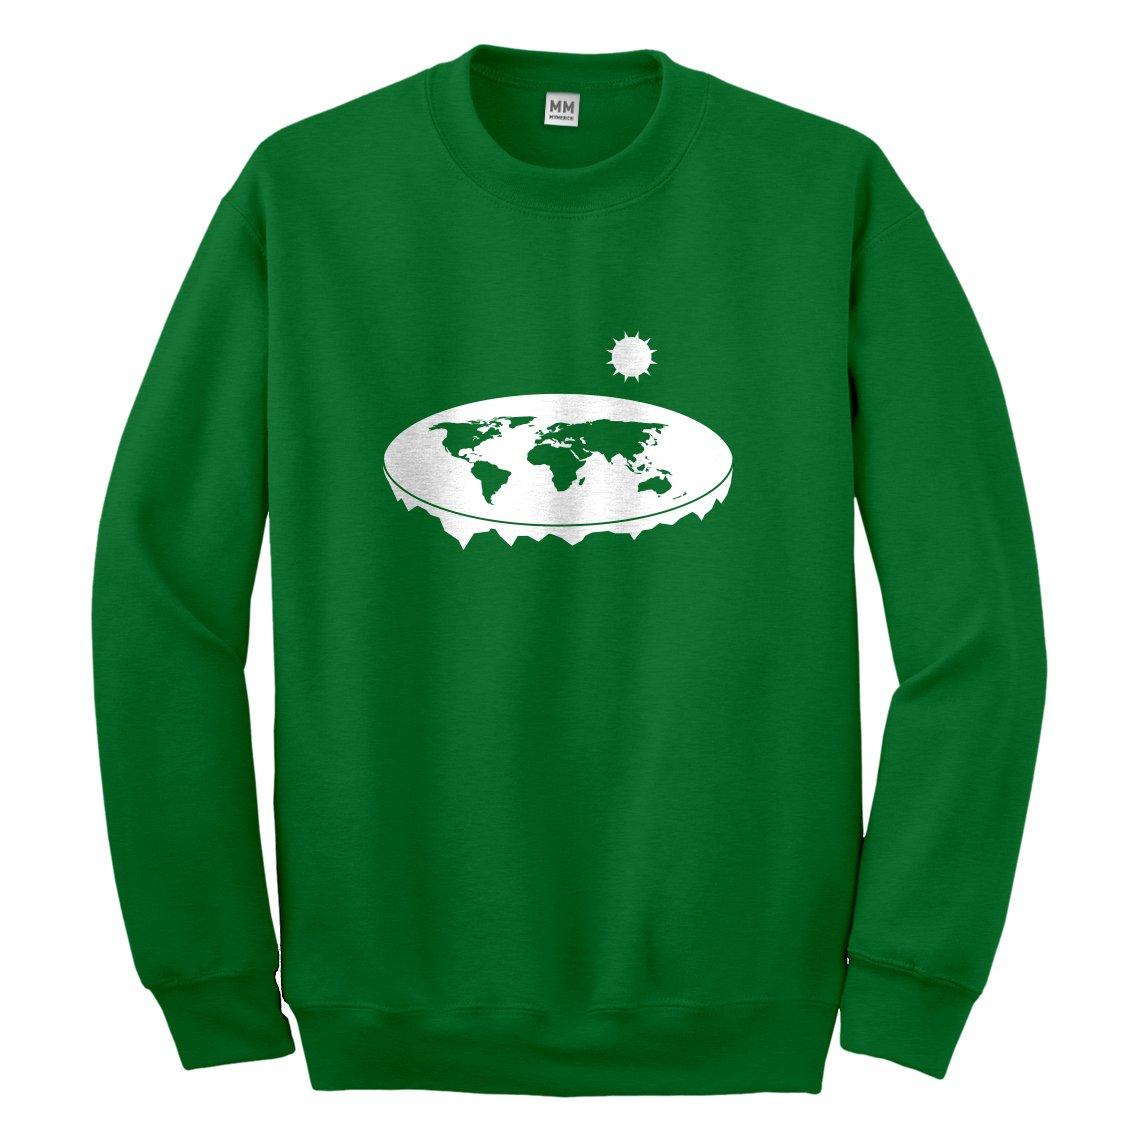 Indica Plateau Flat Earth Sweatshirt 3047-C